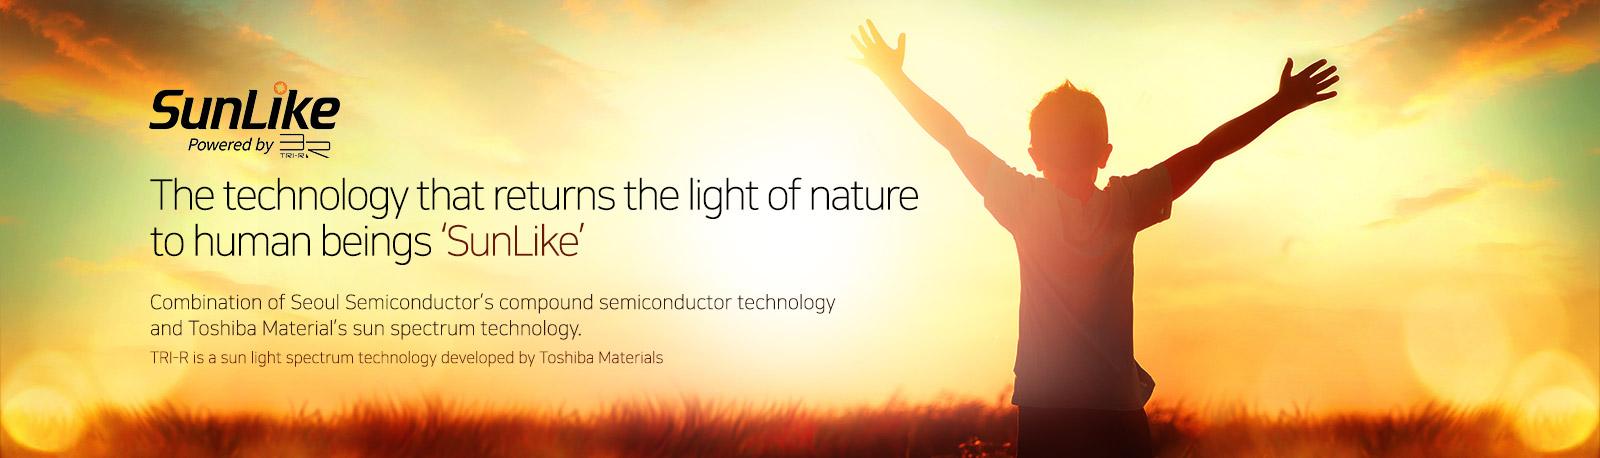 SunLike LED techology from Seoul Semiconductor and Toshiba